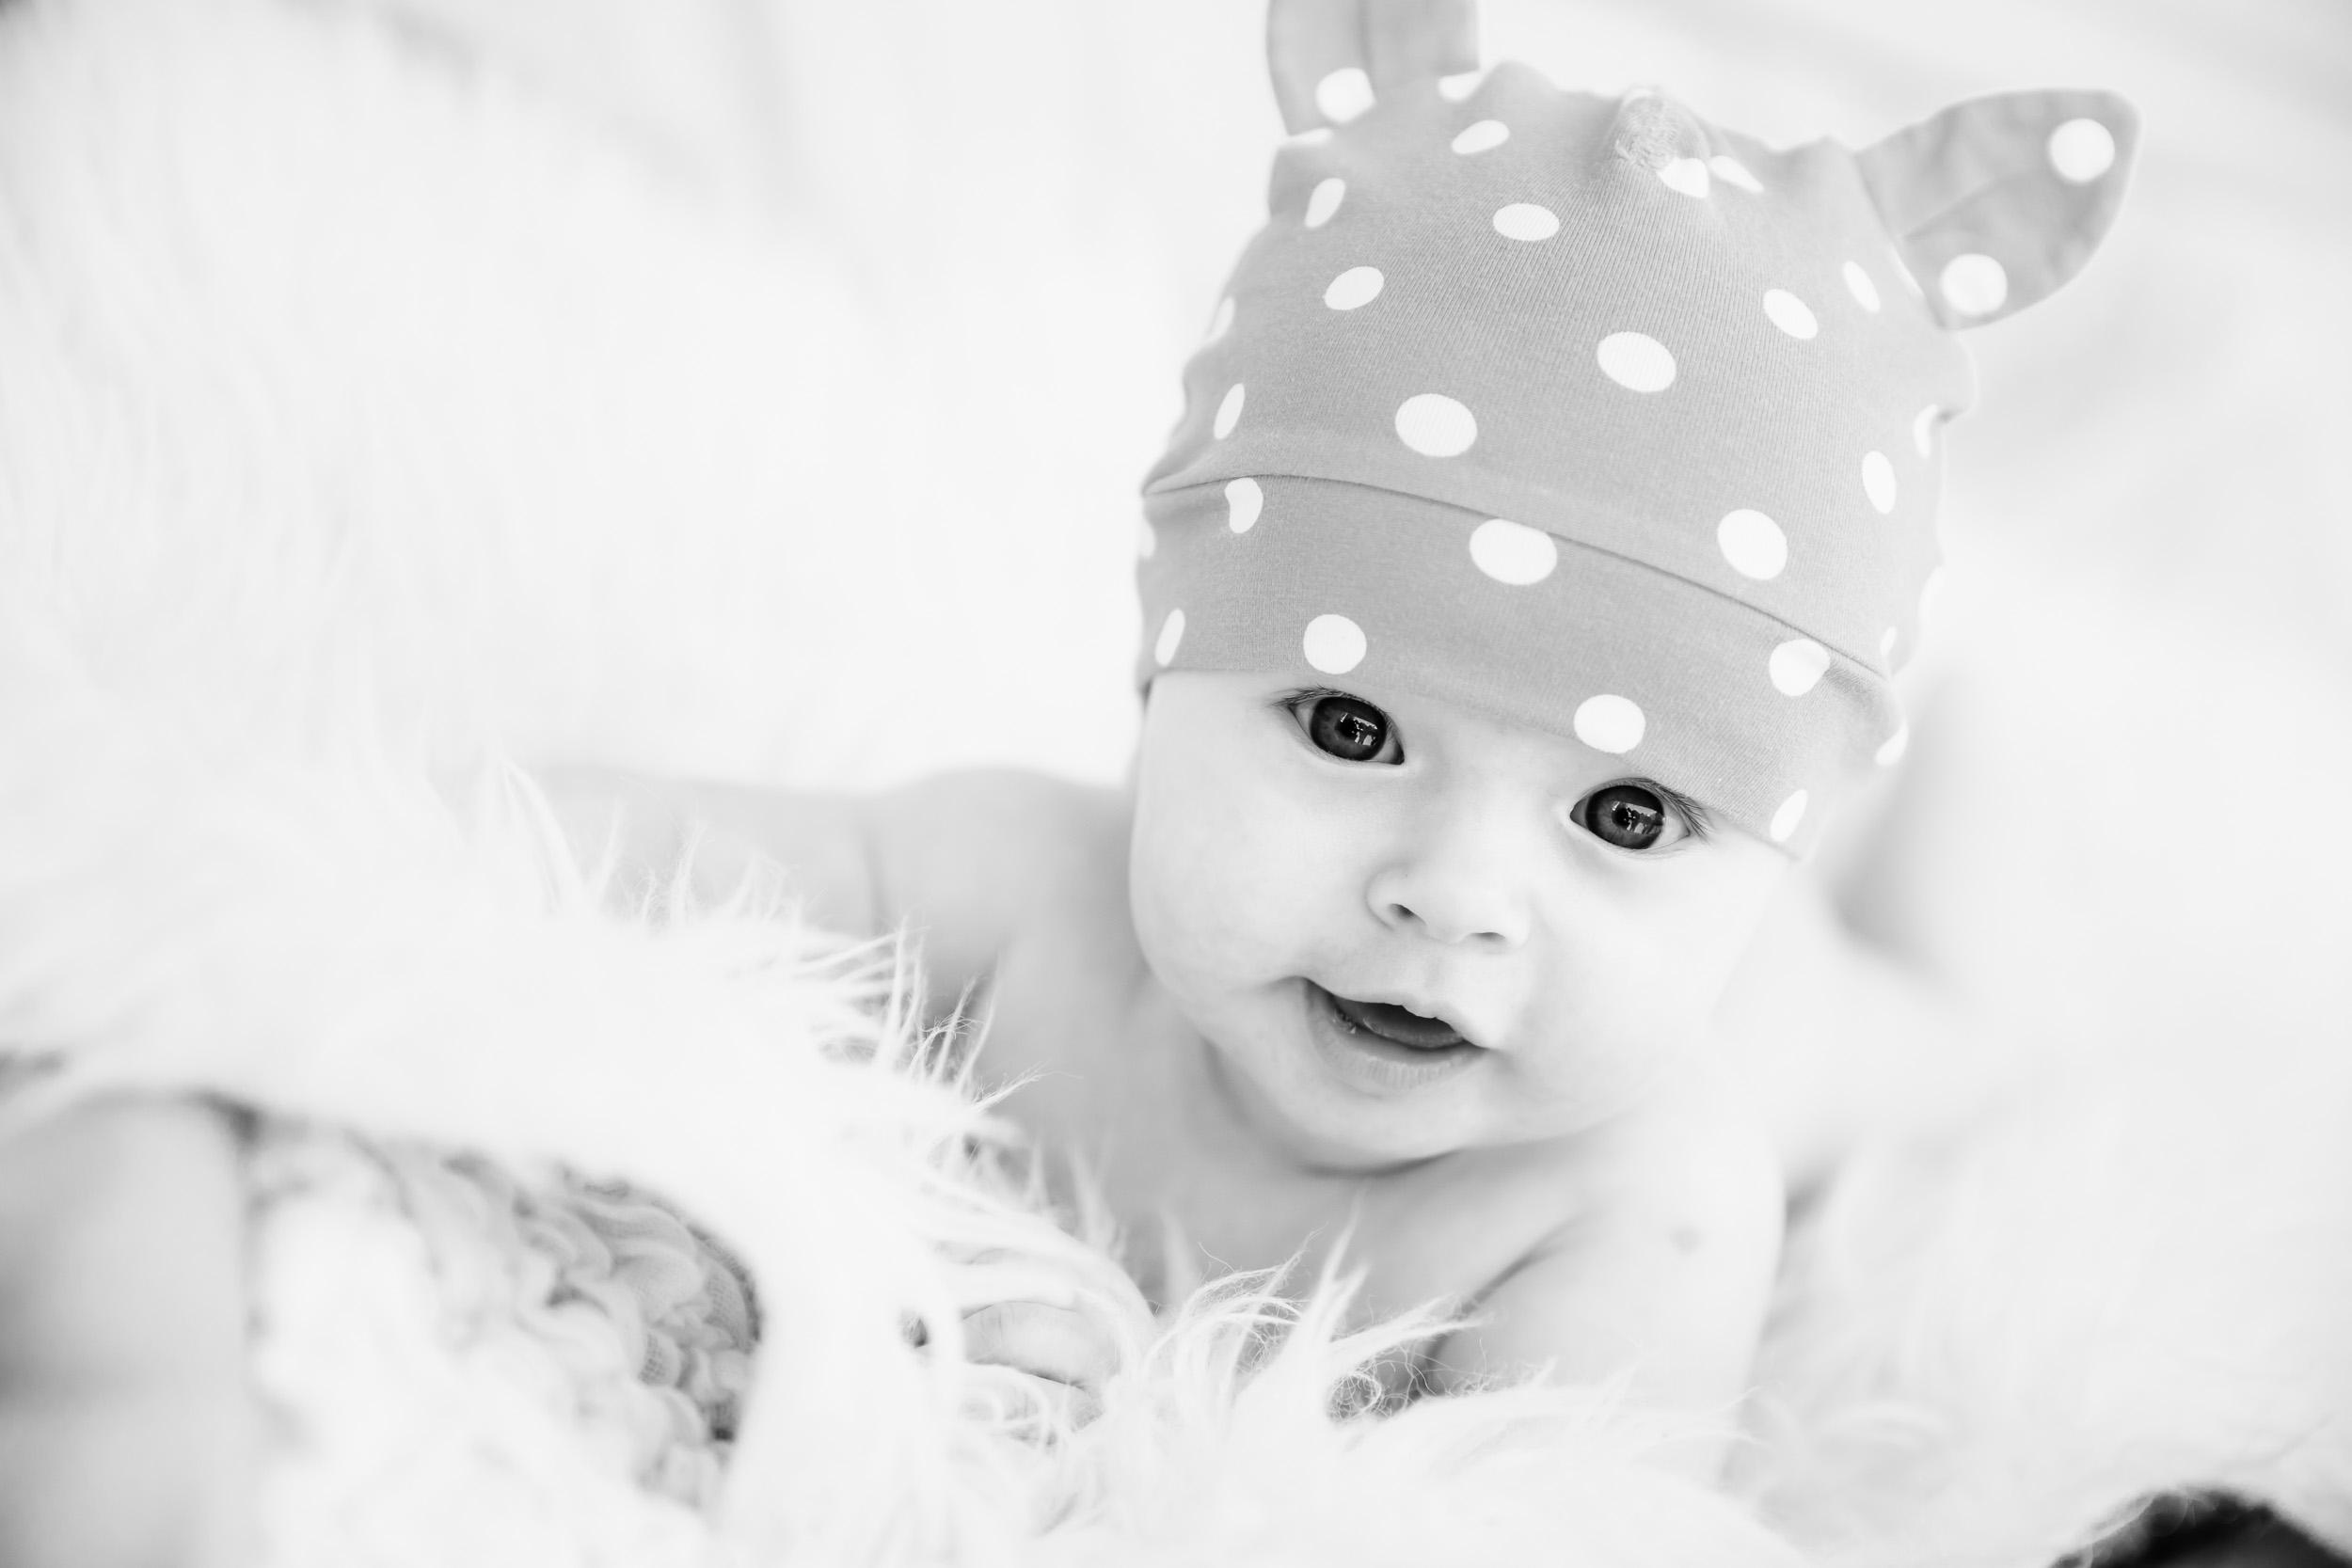 Perhekuvaus-lapsikuvaus-vauvakuvaus-raskaus-valokuvaaja-helsinki-alejandro lorenzo-021.jpg